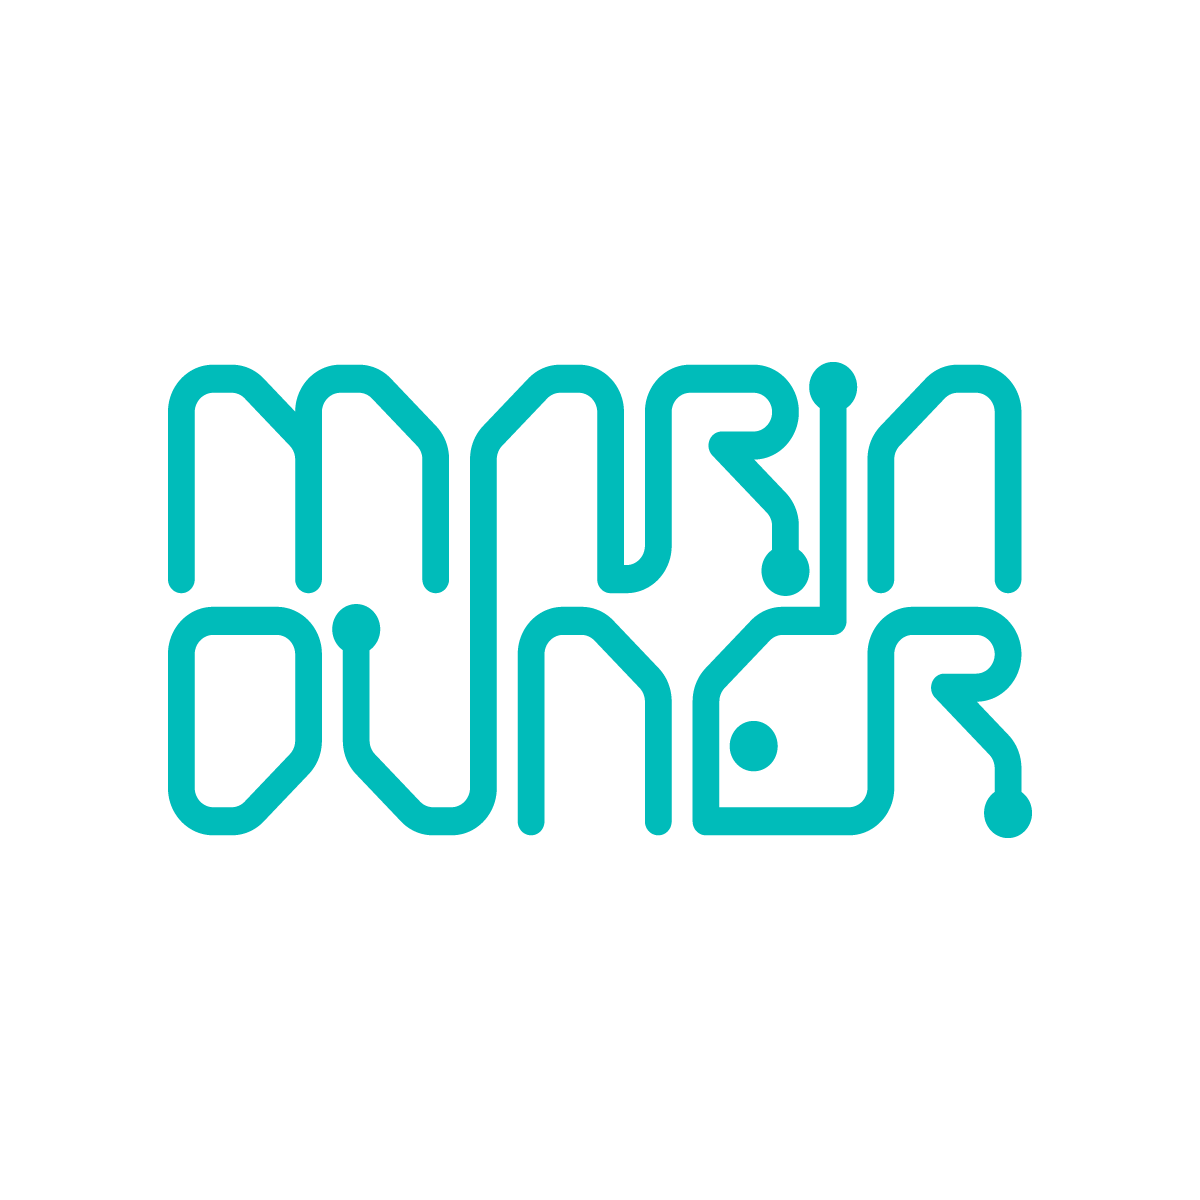 Maria Duner | Digital Strategist